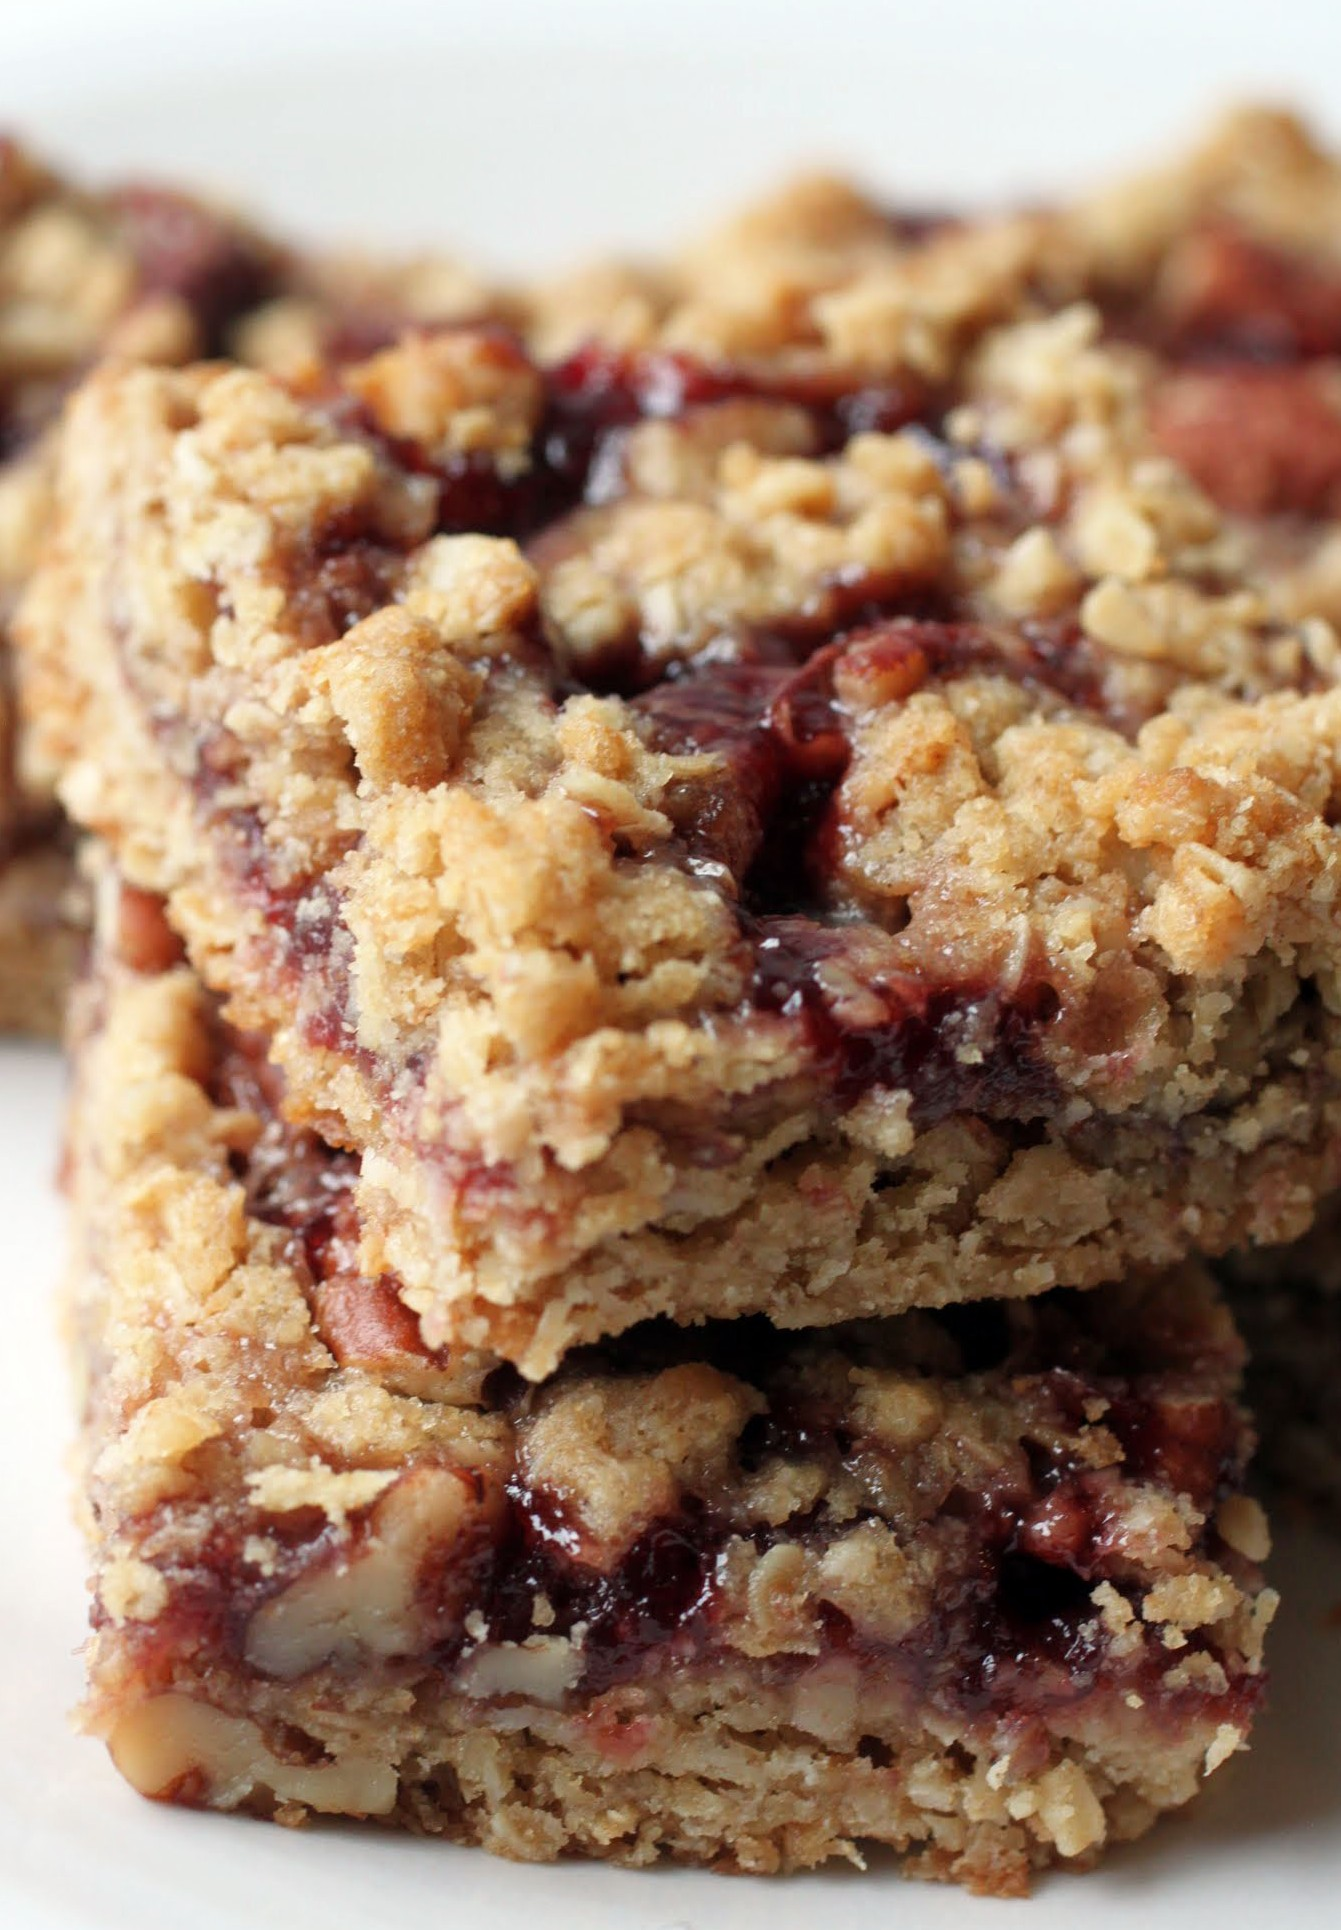 Raspberry Pecan Crumb Bars (GF)